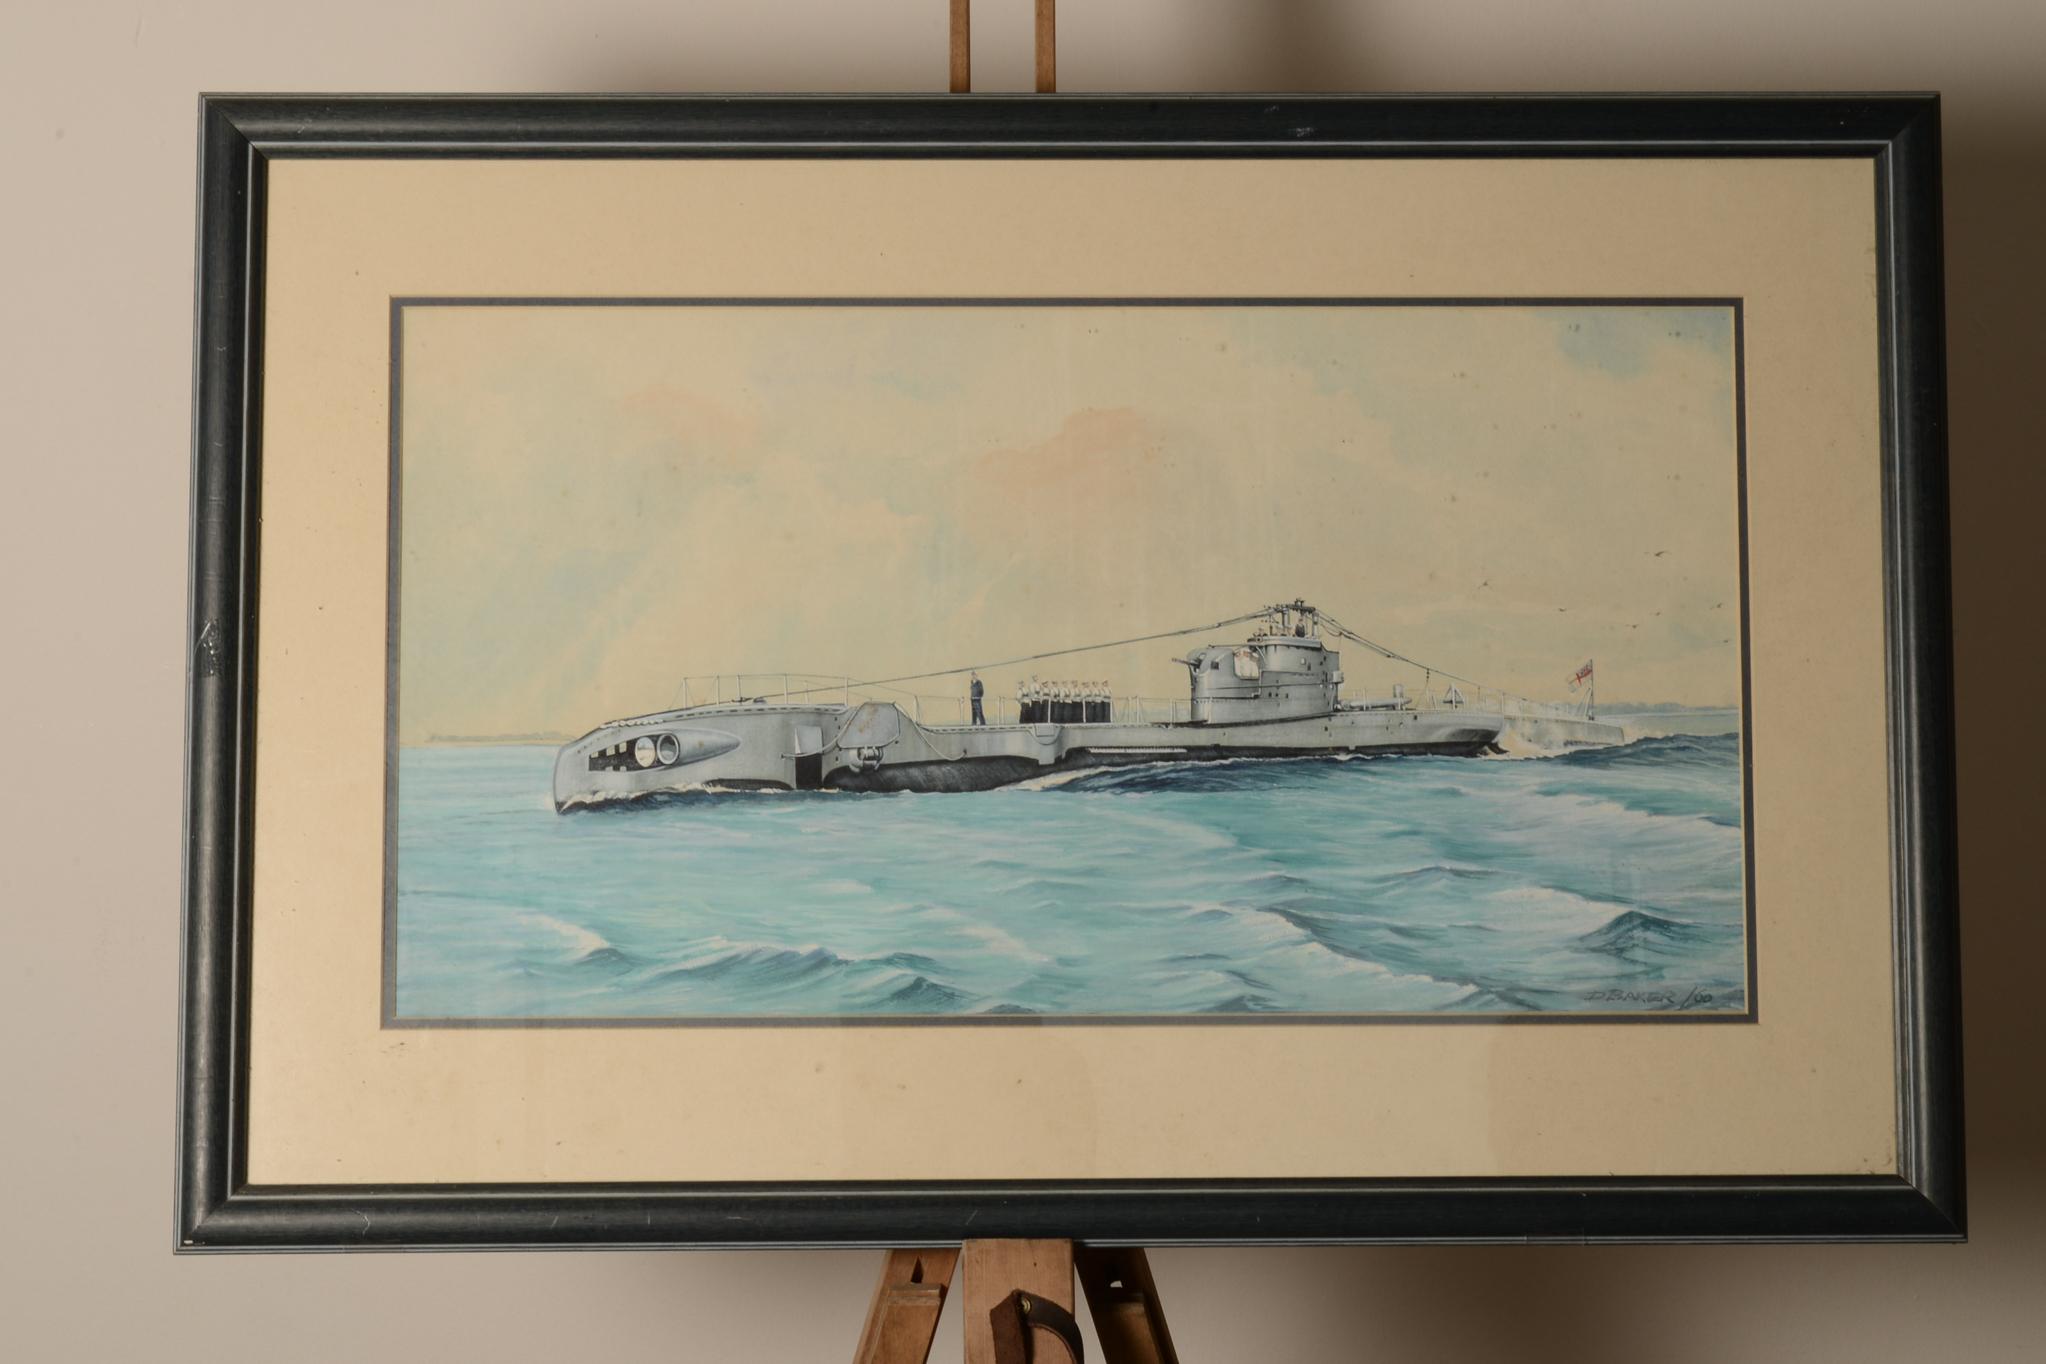 Lot 25 - 1960's Gouache illustration of WW2 Submarine. Possibly HMS Urge